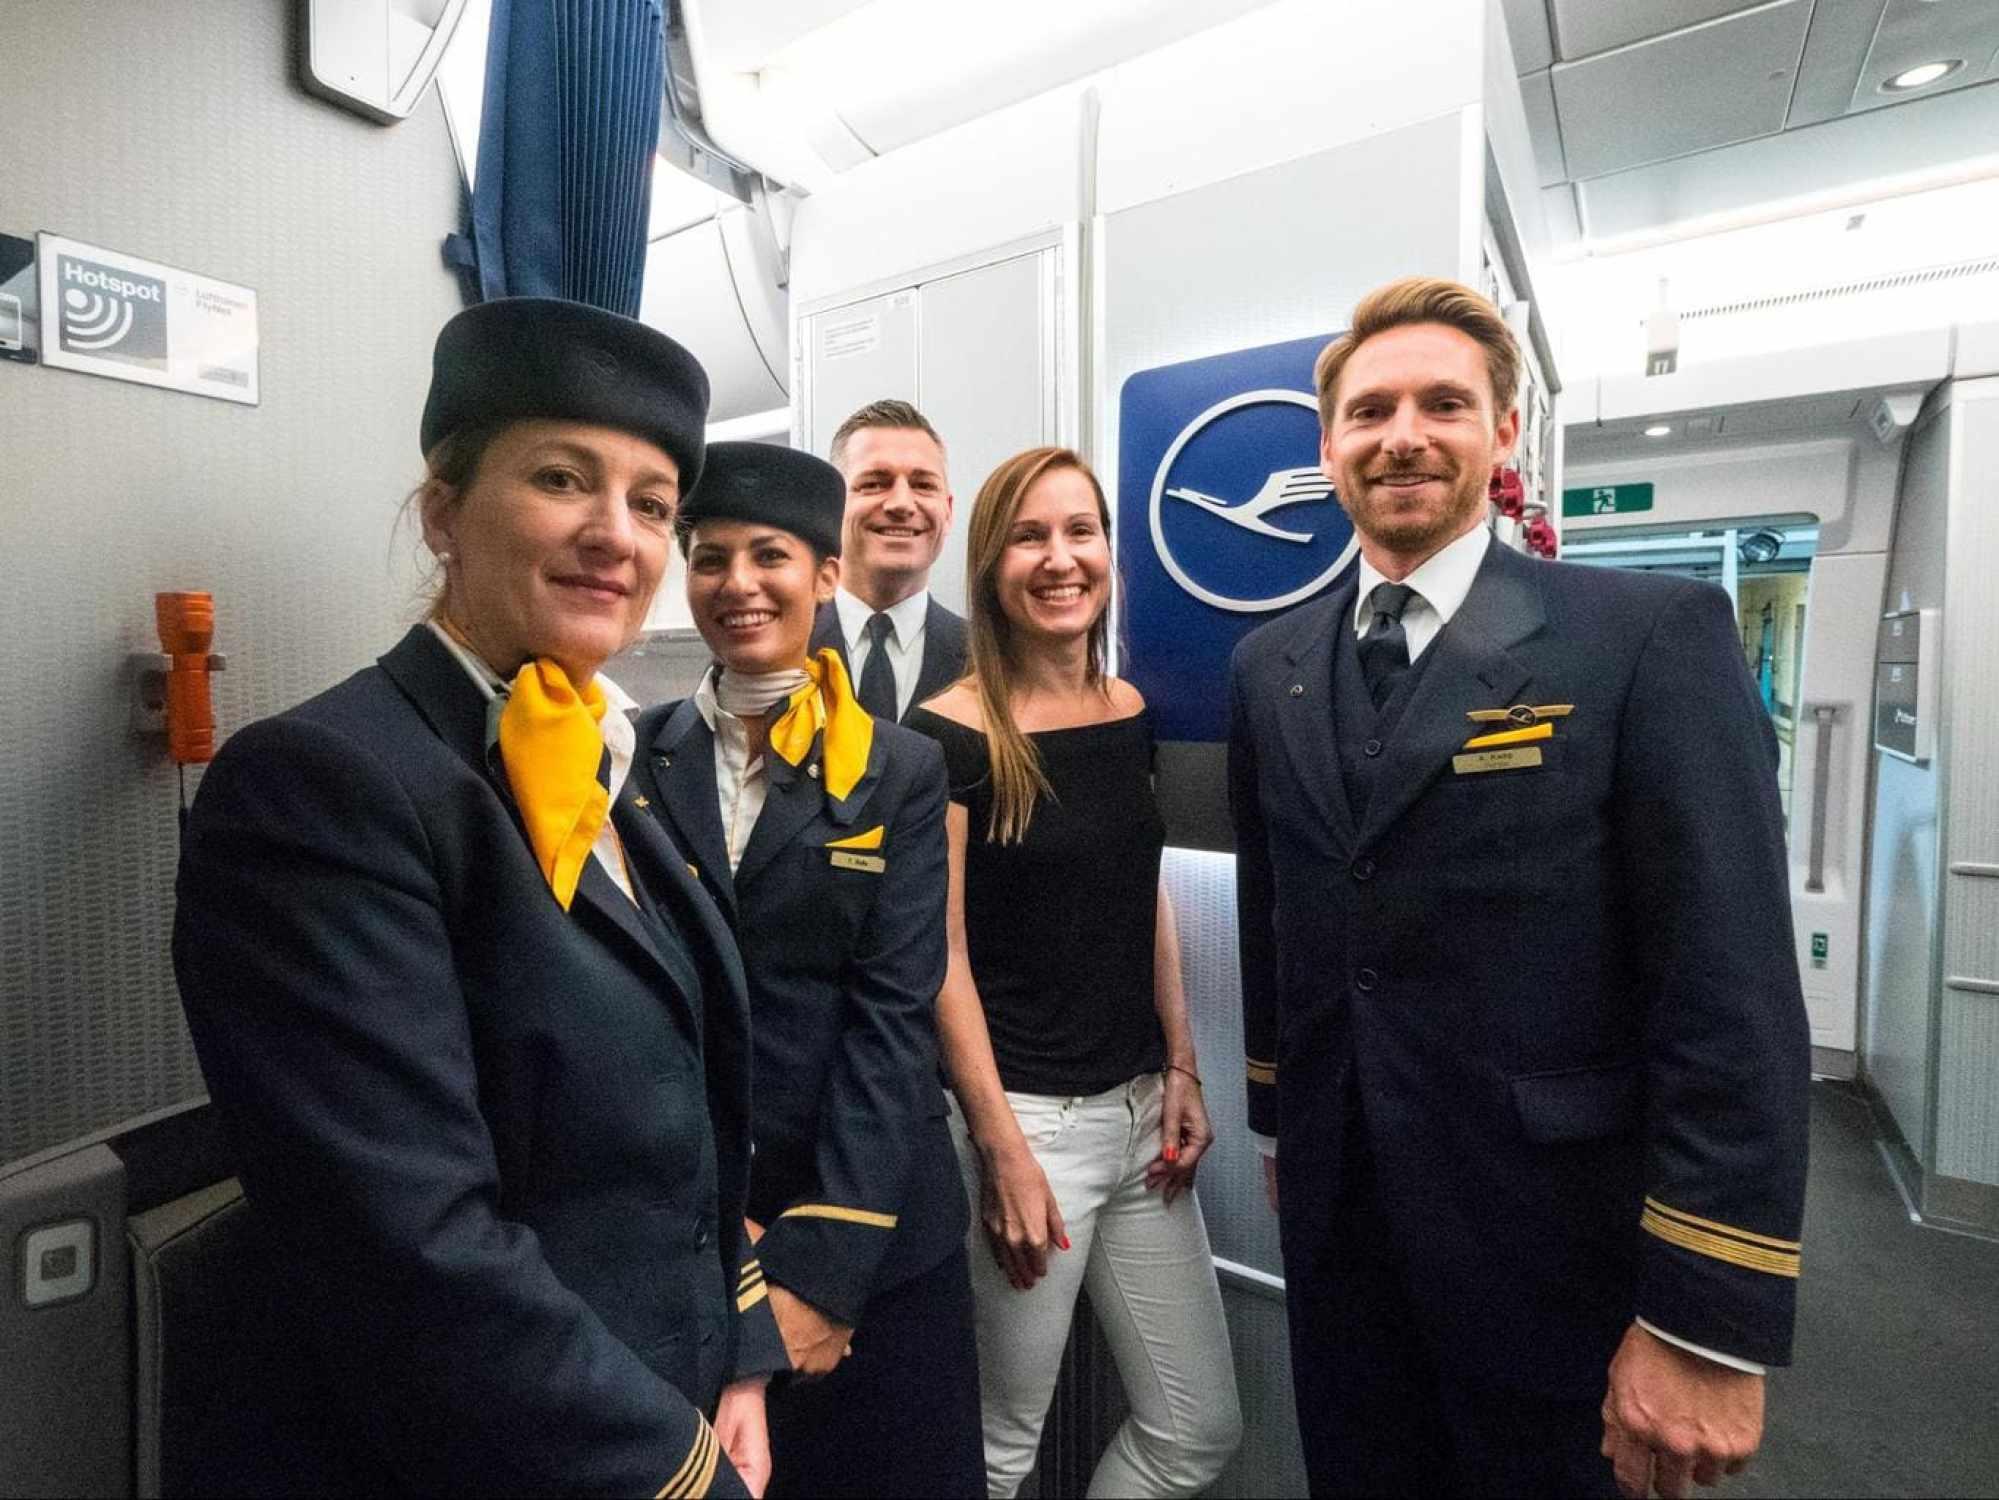 The Business Class crew onboard my flight